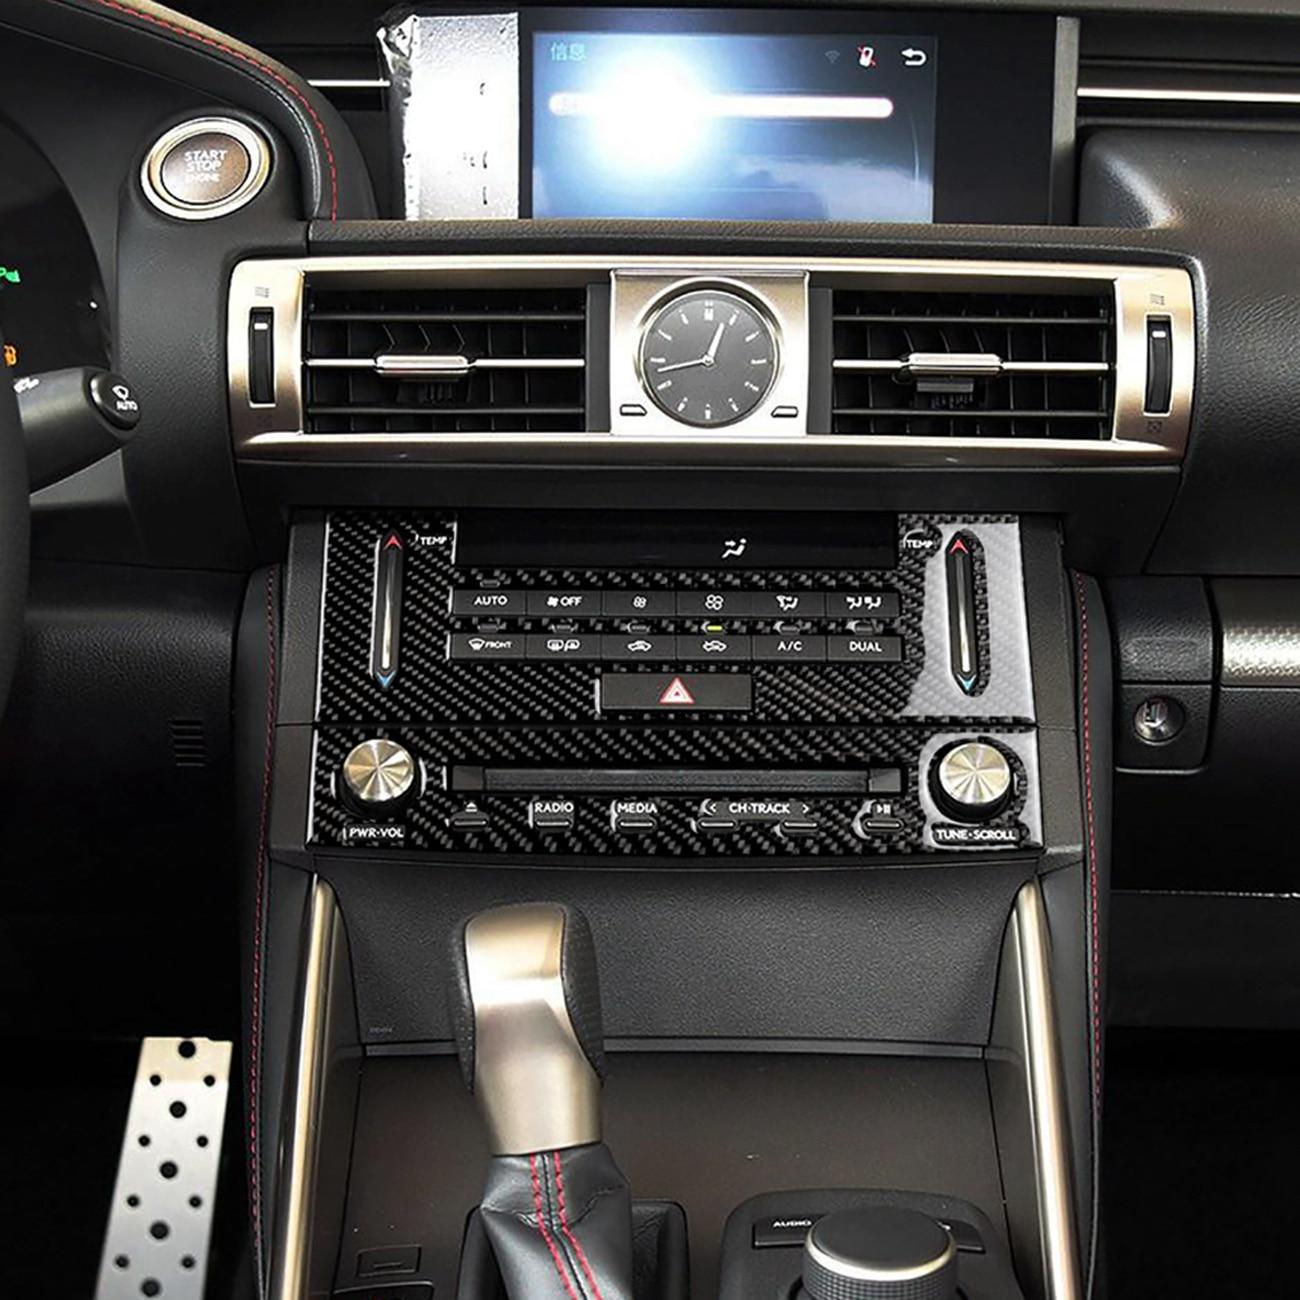 2 PCS Carbon Fiber Center Console Dashboard CD Media Navigation Panel Frame Decal Cover Trim for Lexus IS250